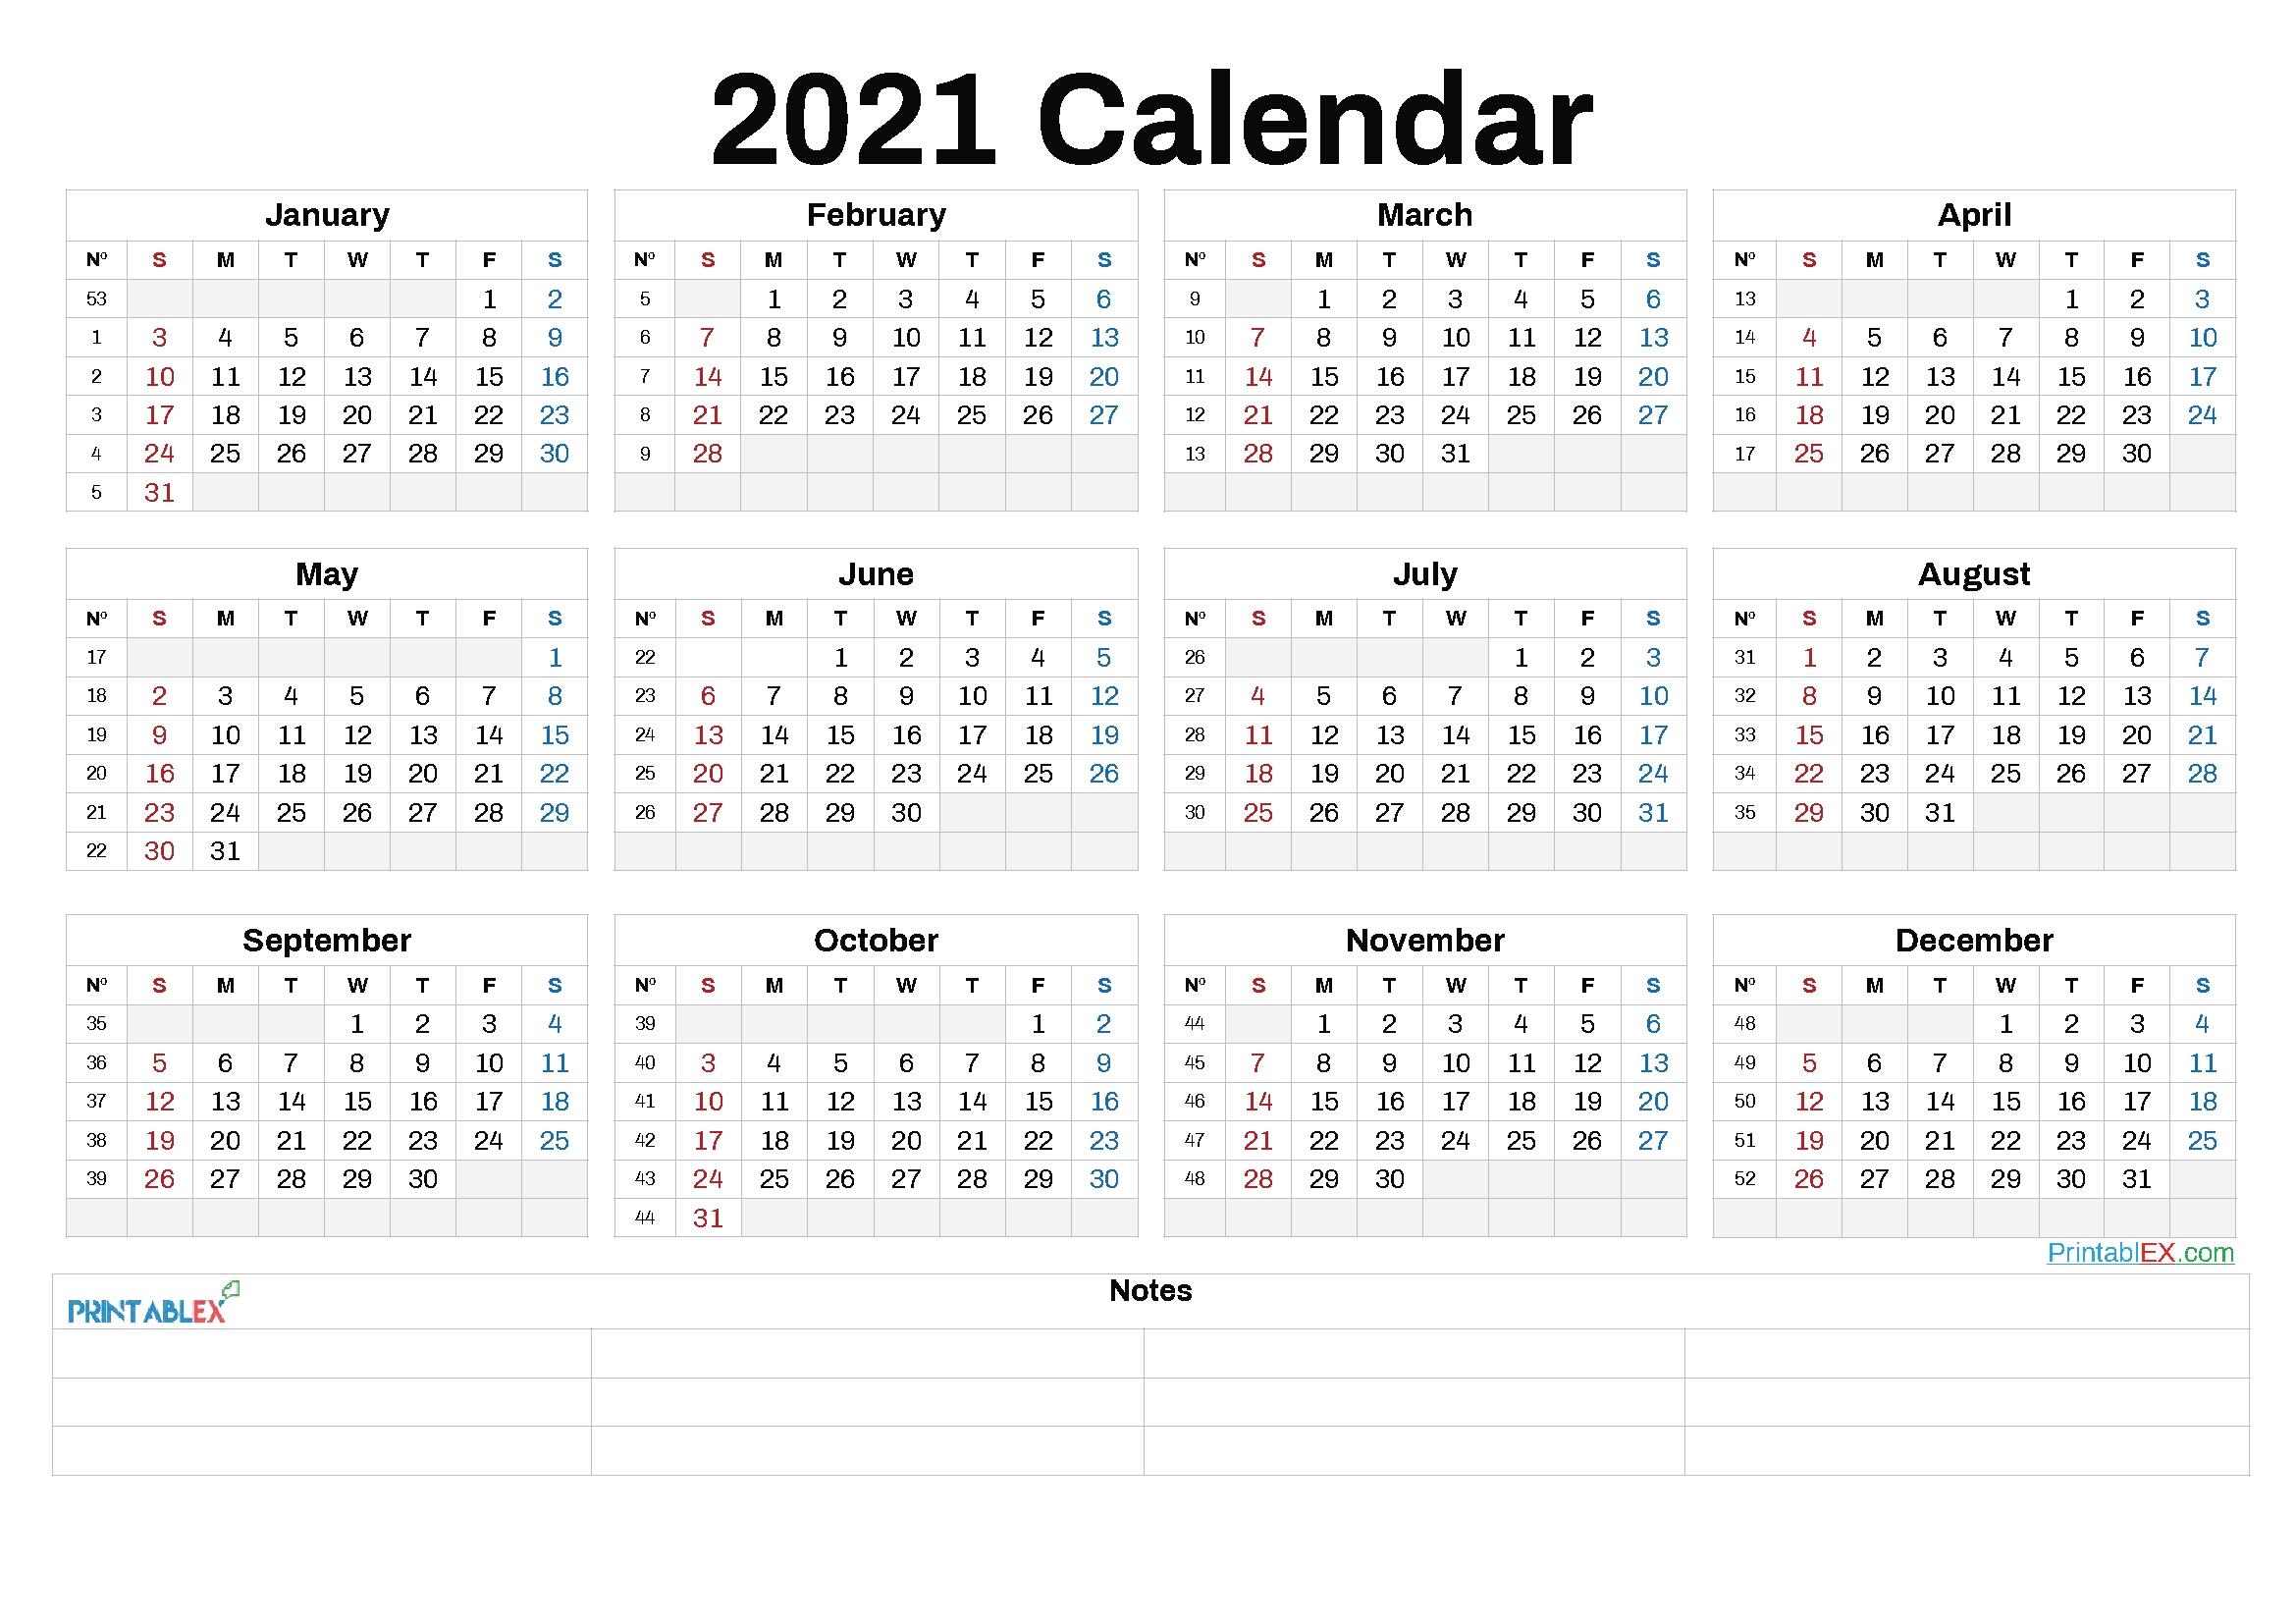 2021 Annual Calendar Printable – 21Ytw89 – Free 2020 And